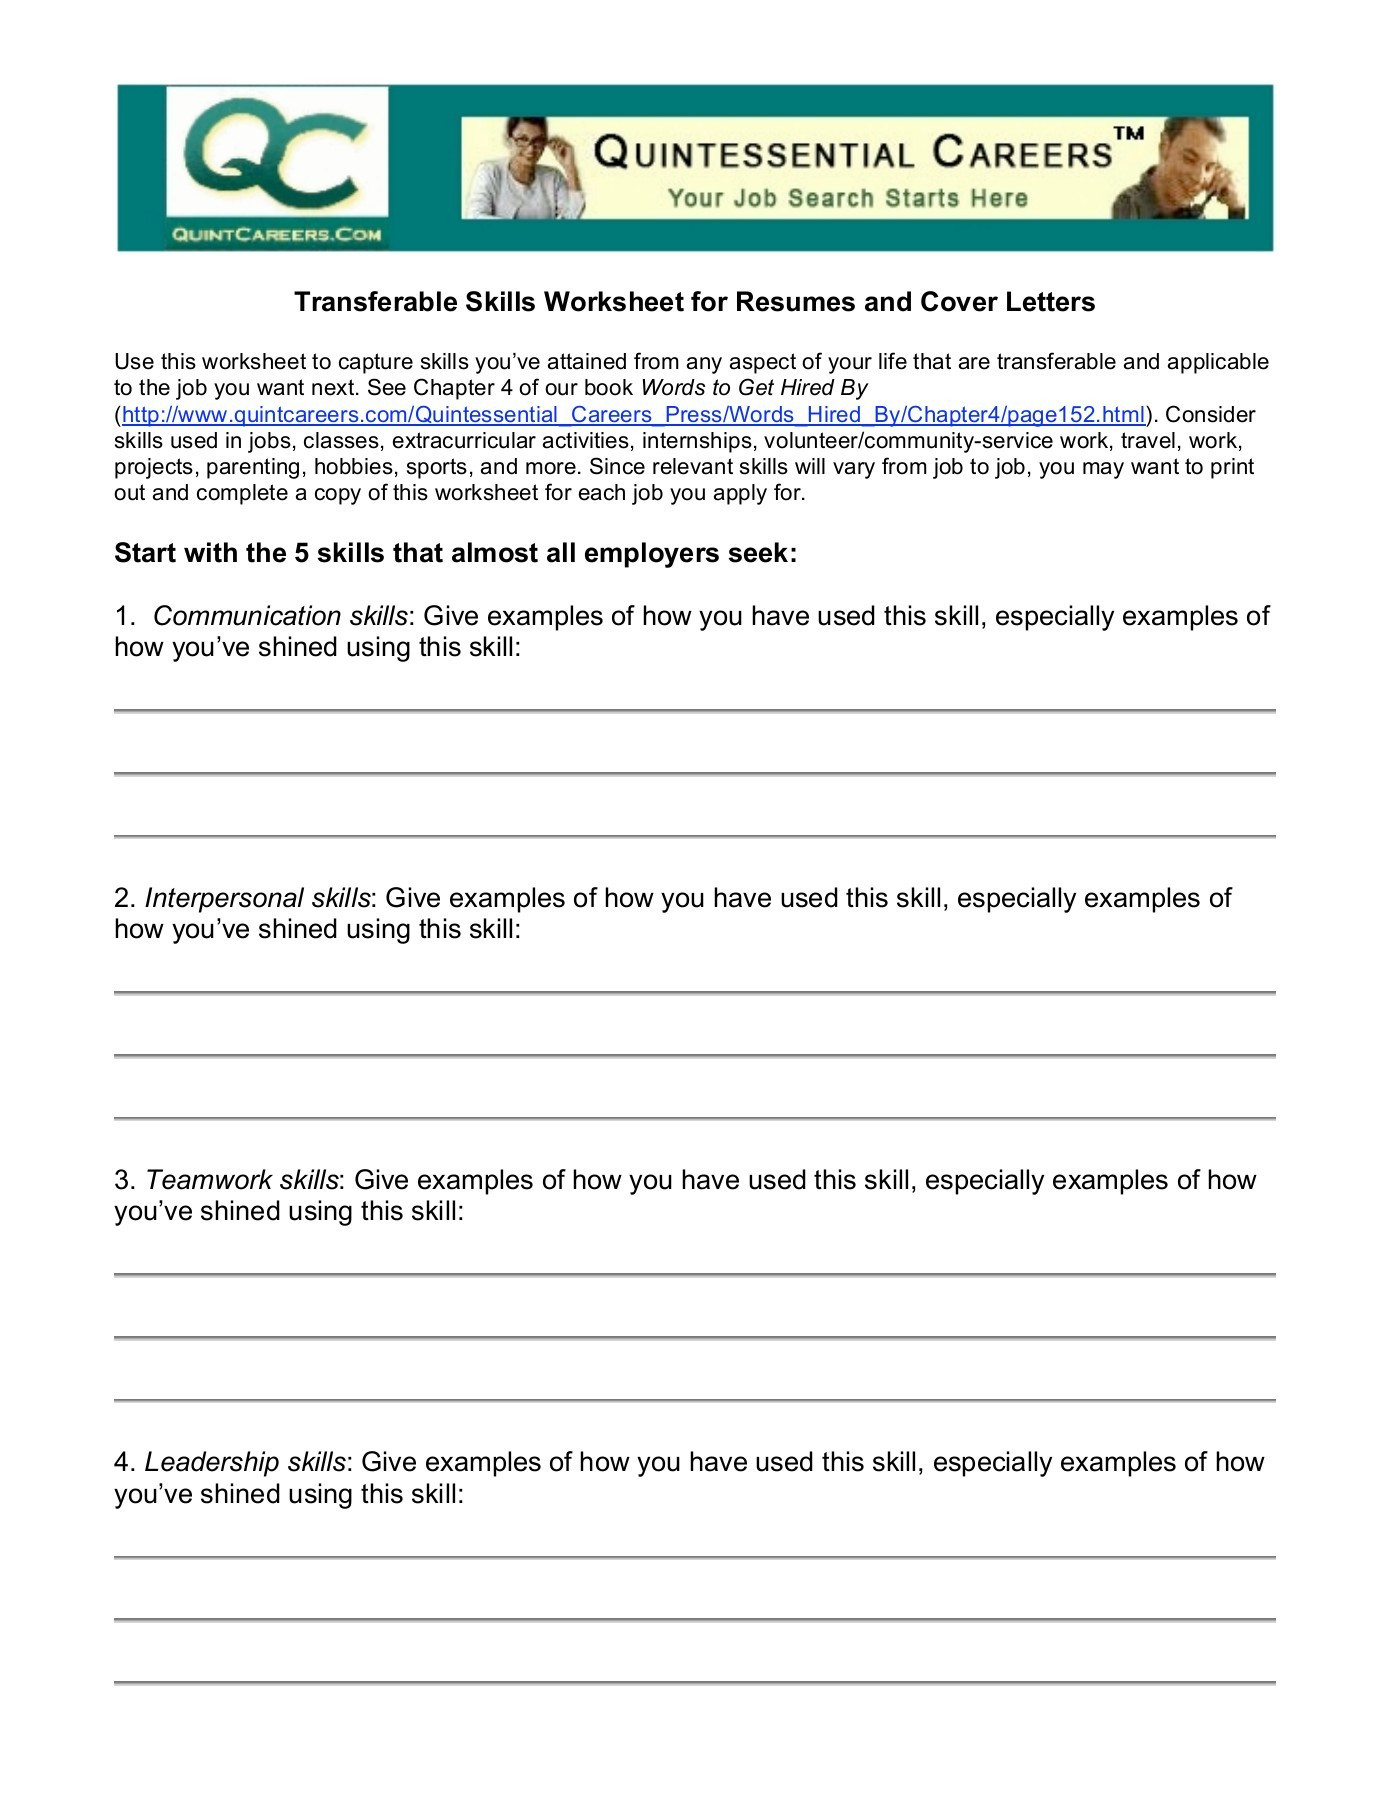 Job Readiness Printable Worksheets Skills Worksheet